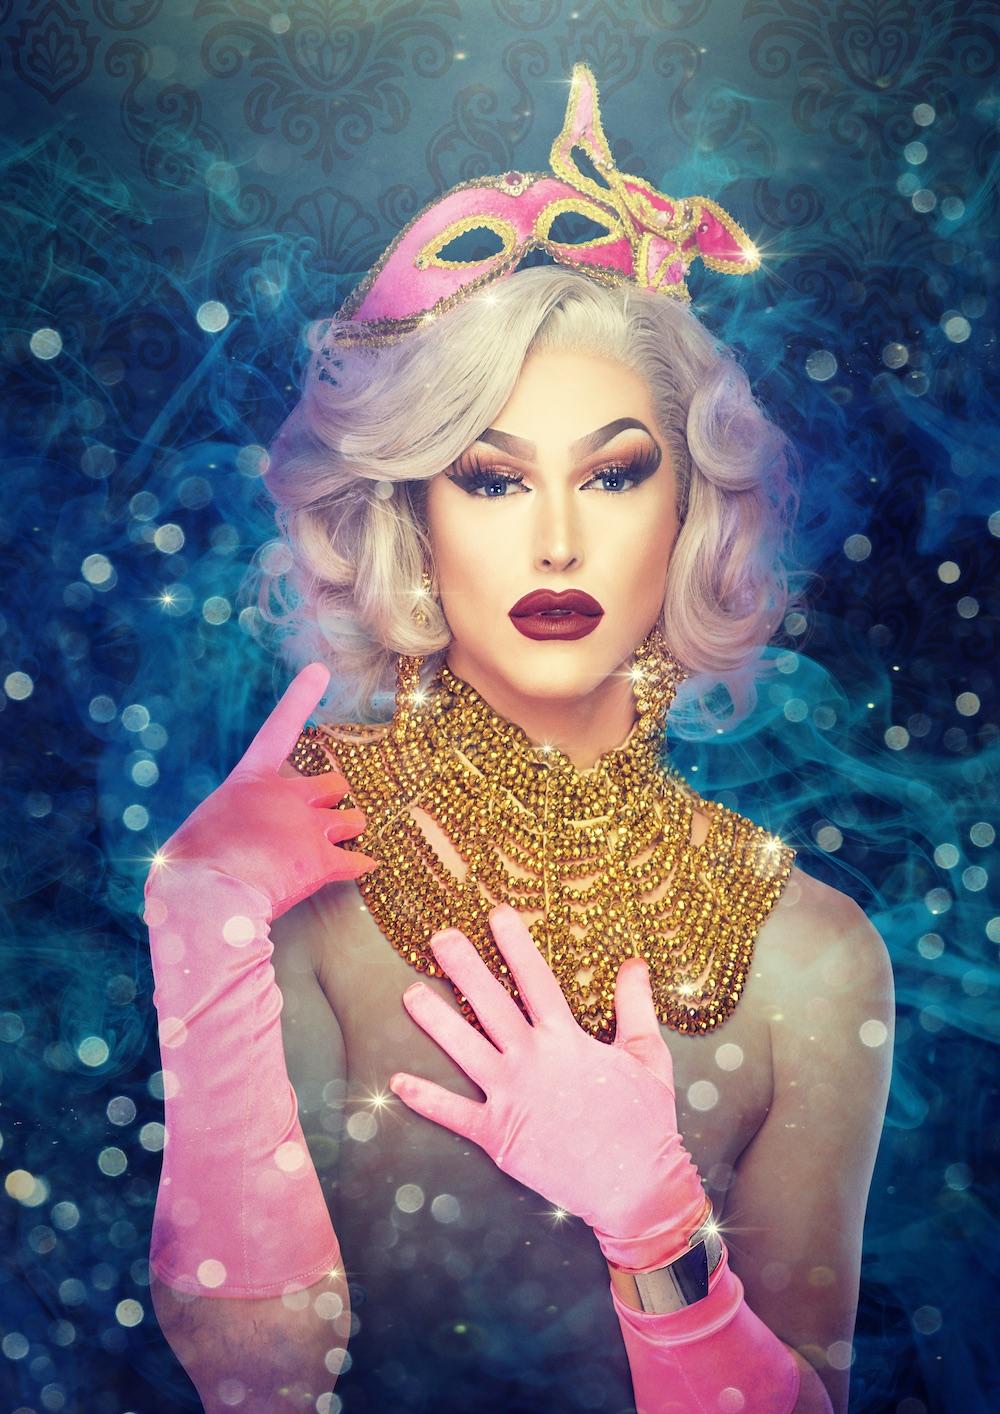 arq-masqueerade-sia-tequila-sydney-drag-queen.jpg